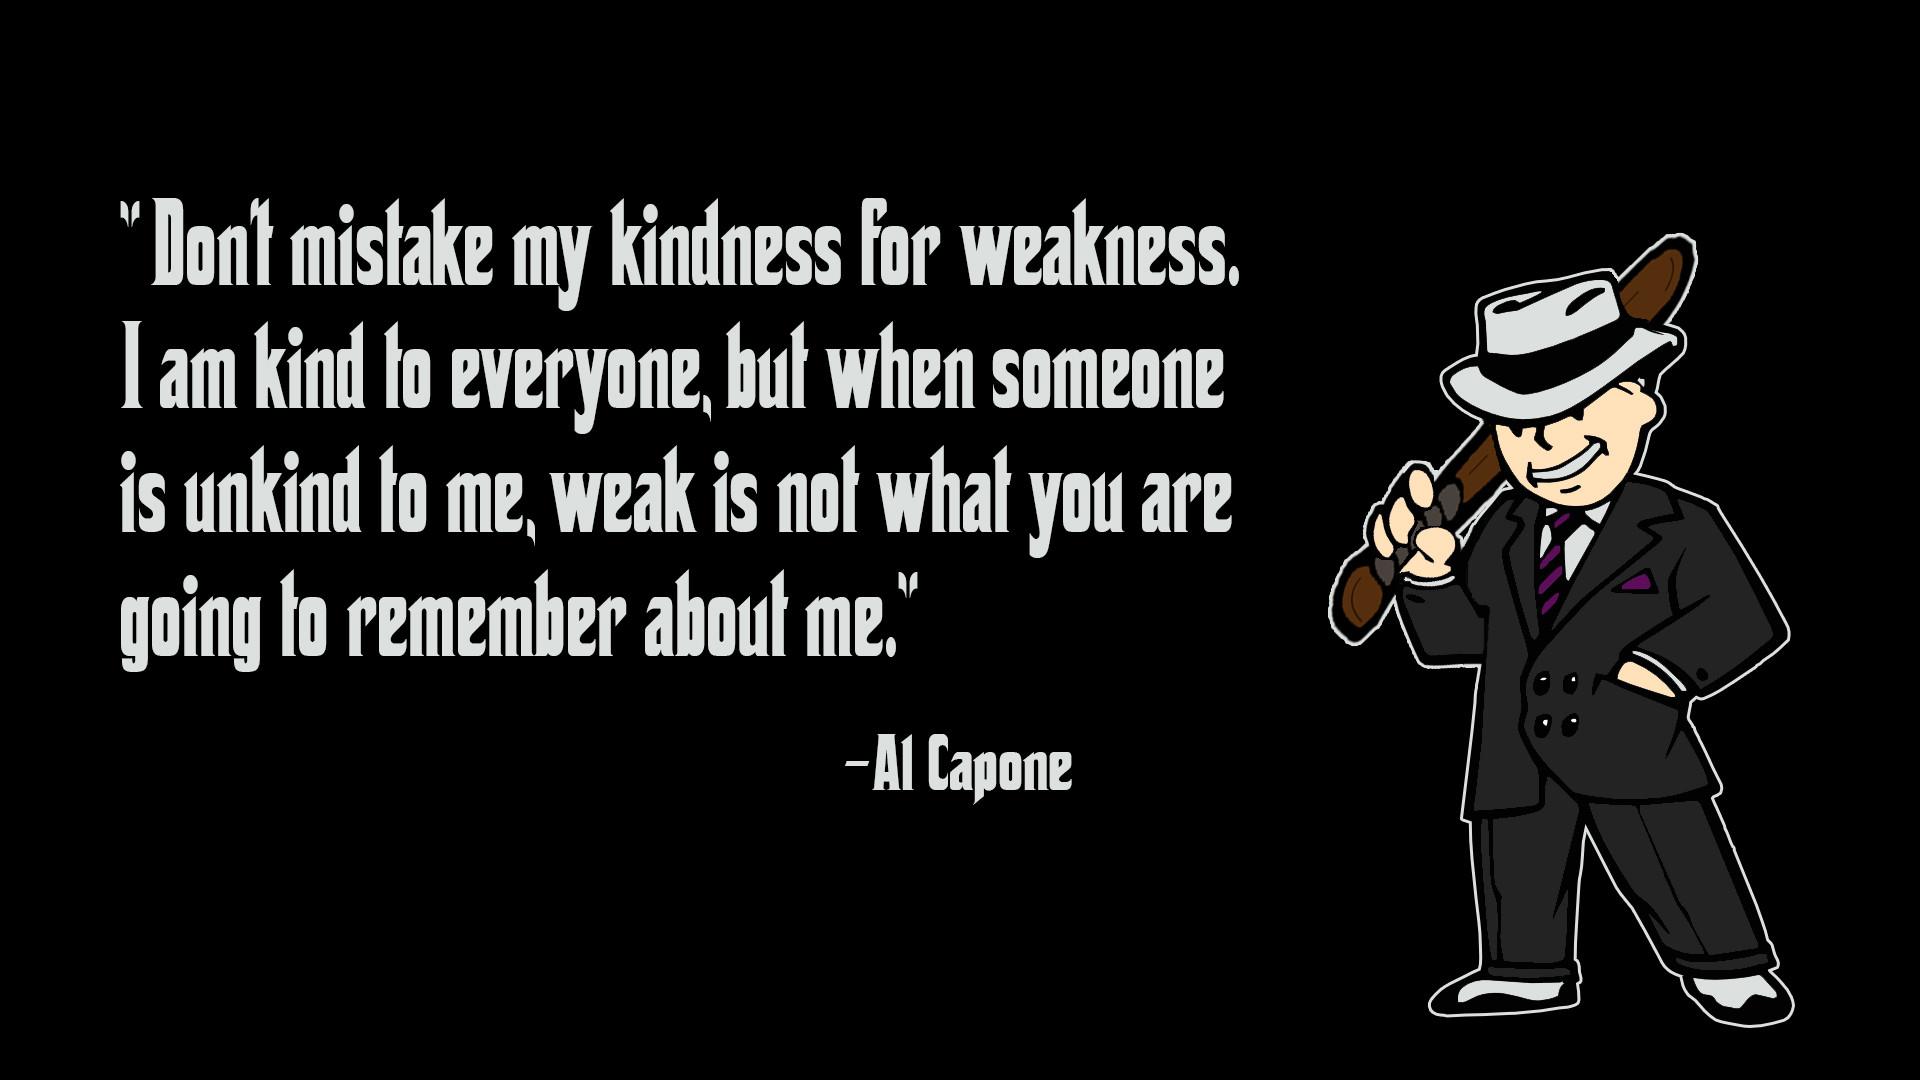 Al Capone Quote Kindness  Fallout Kindness Al Capone by ImTabe on DeviantArt